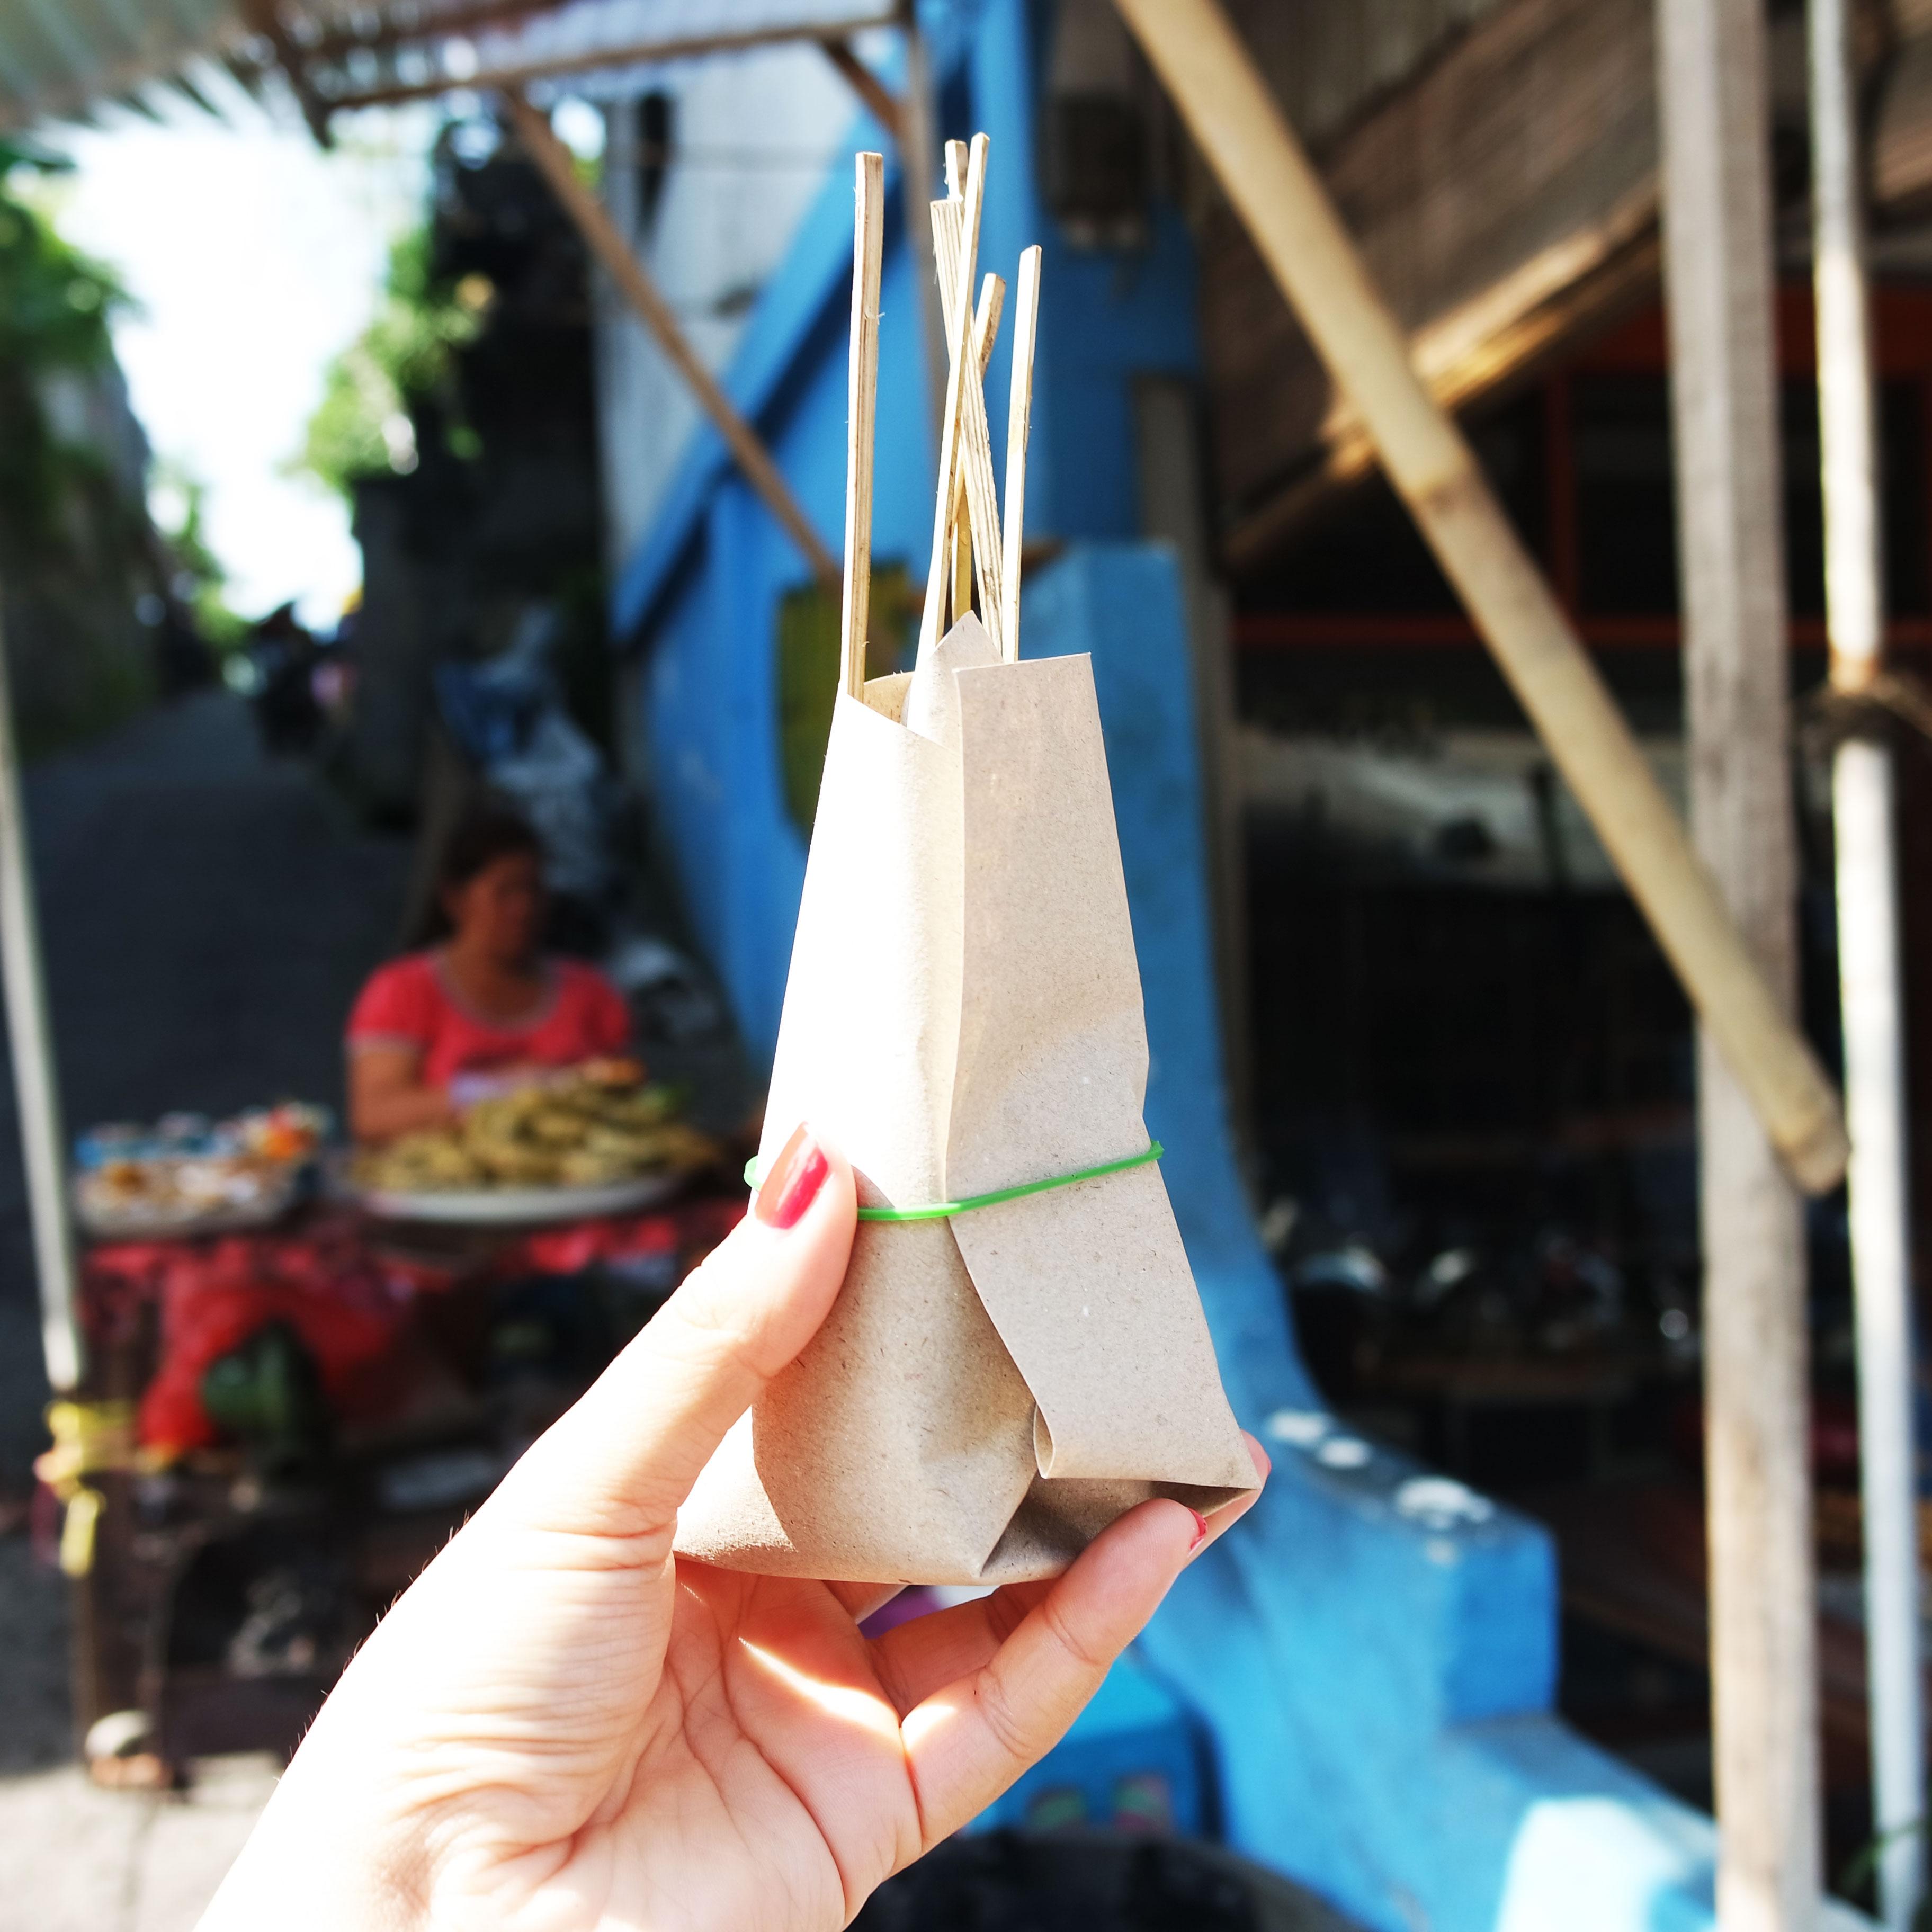 ubud-restaurant-pas-cher-meilleur-bbq-bali-blog-avis